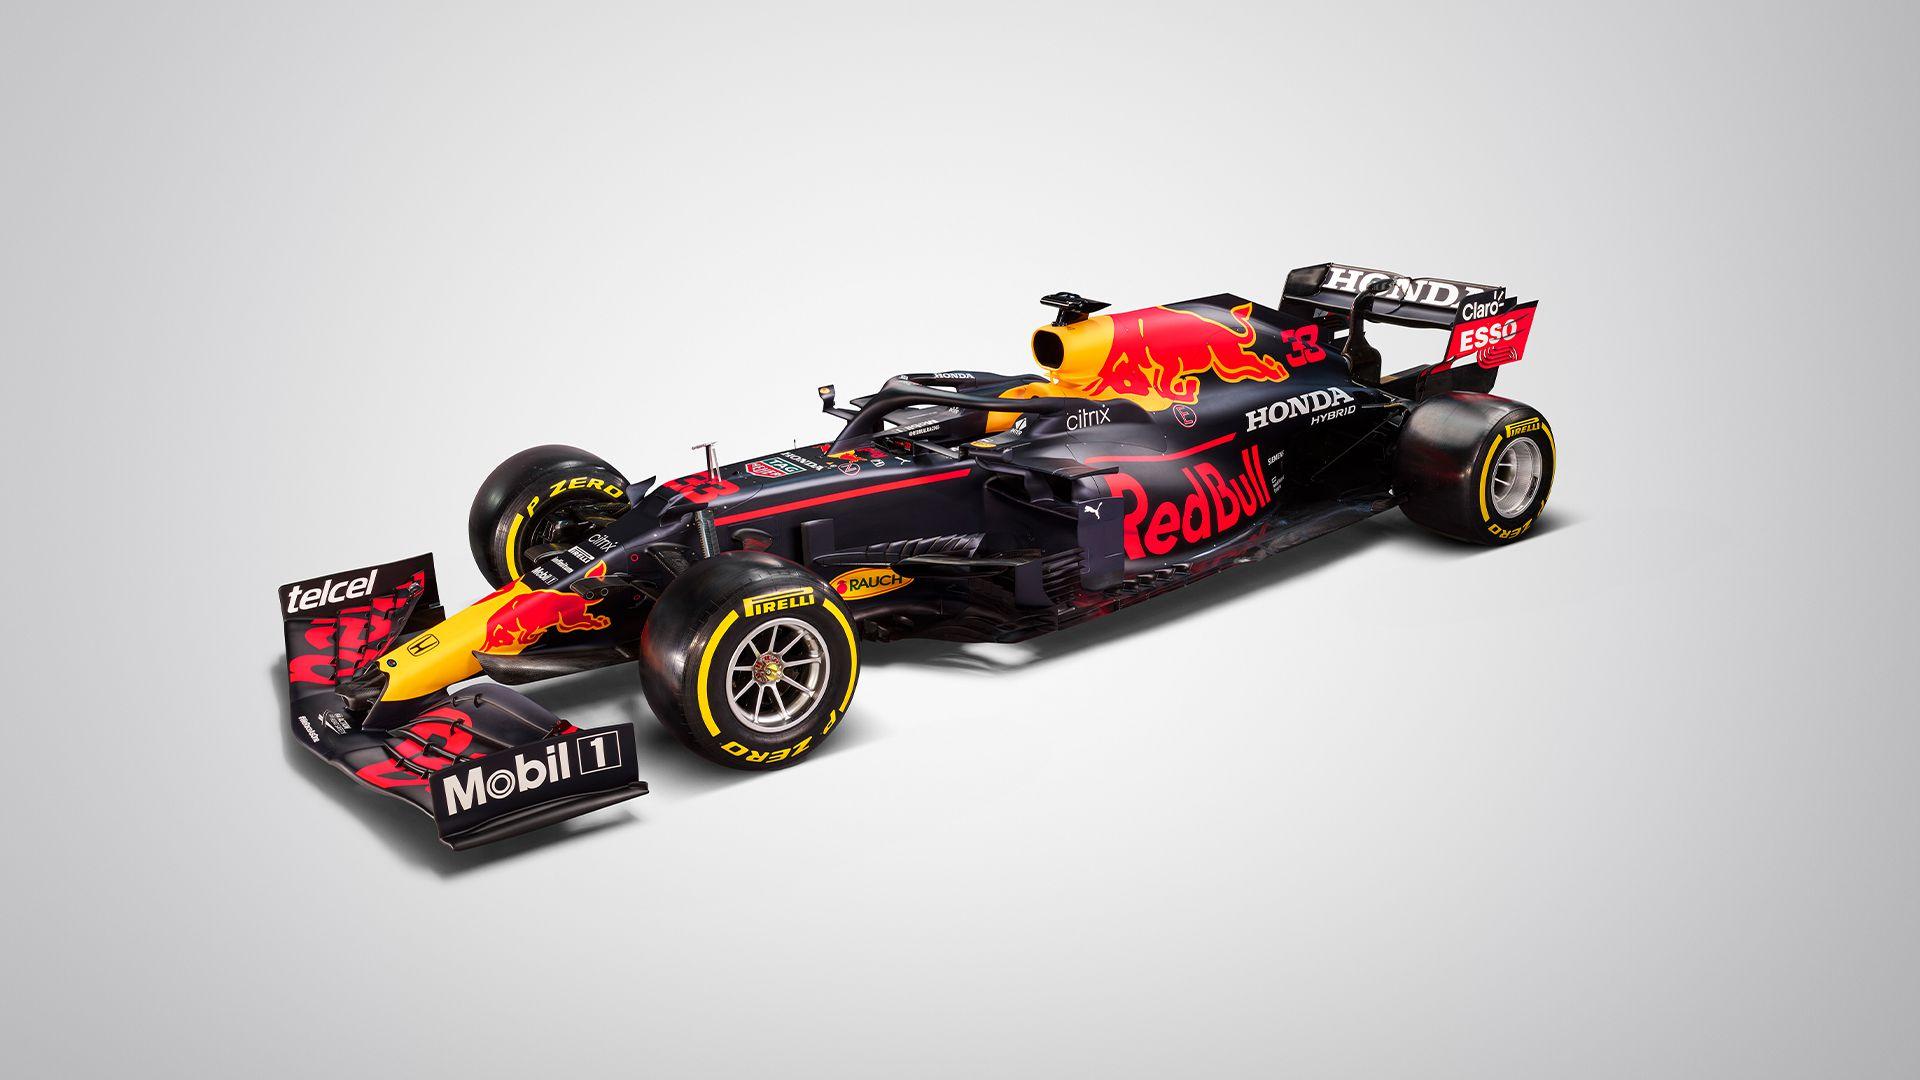 Red Bull presentó su monoplaza RB16B (Foto: Twitter@redbullracing)